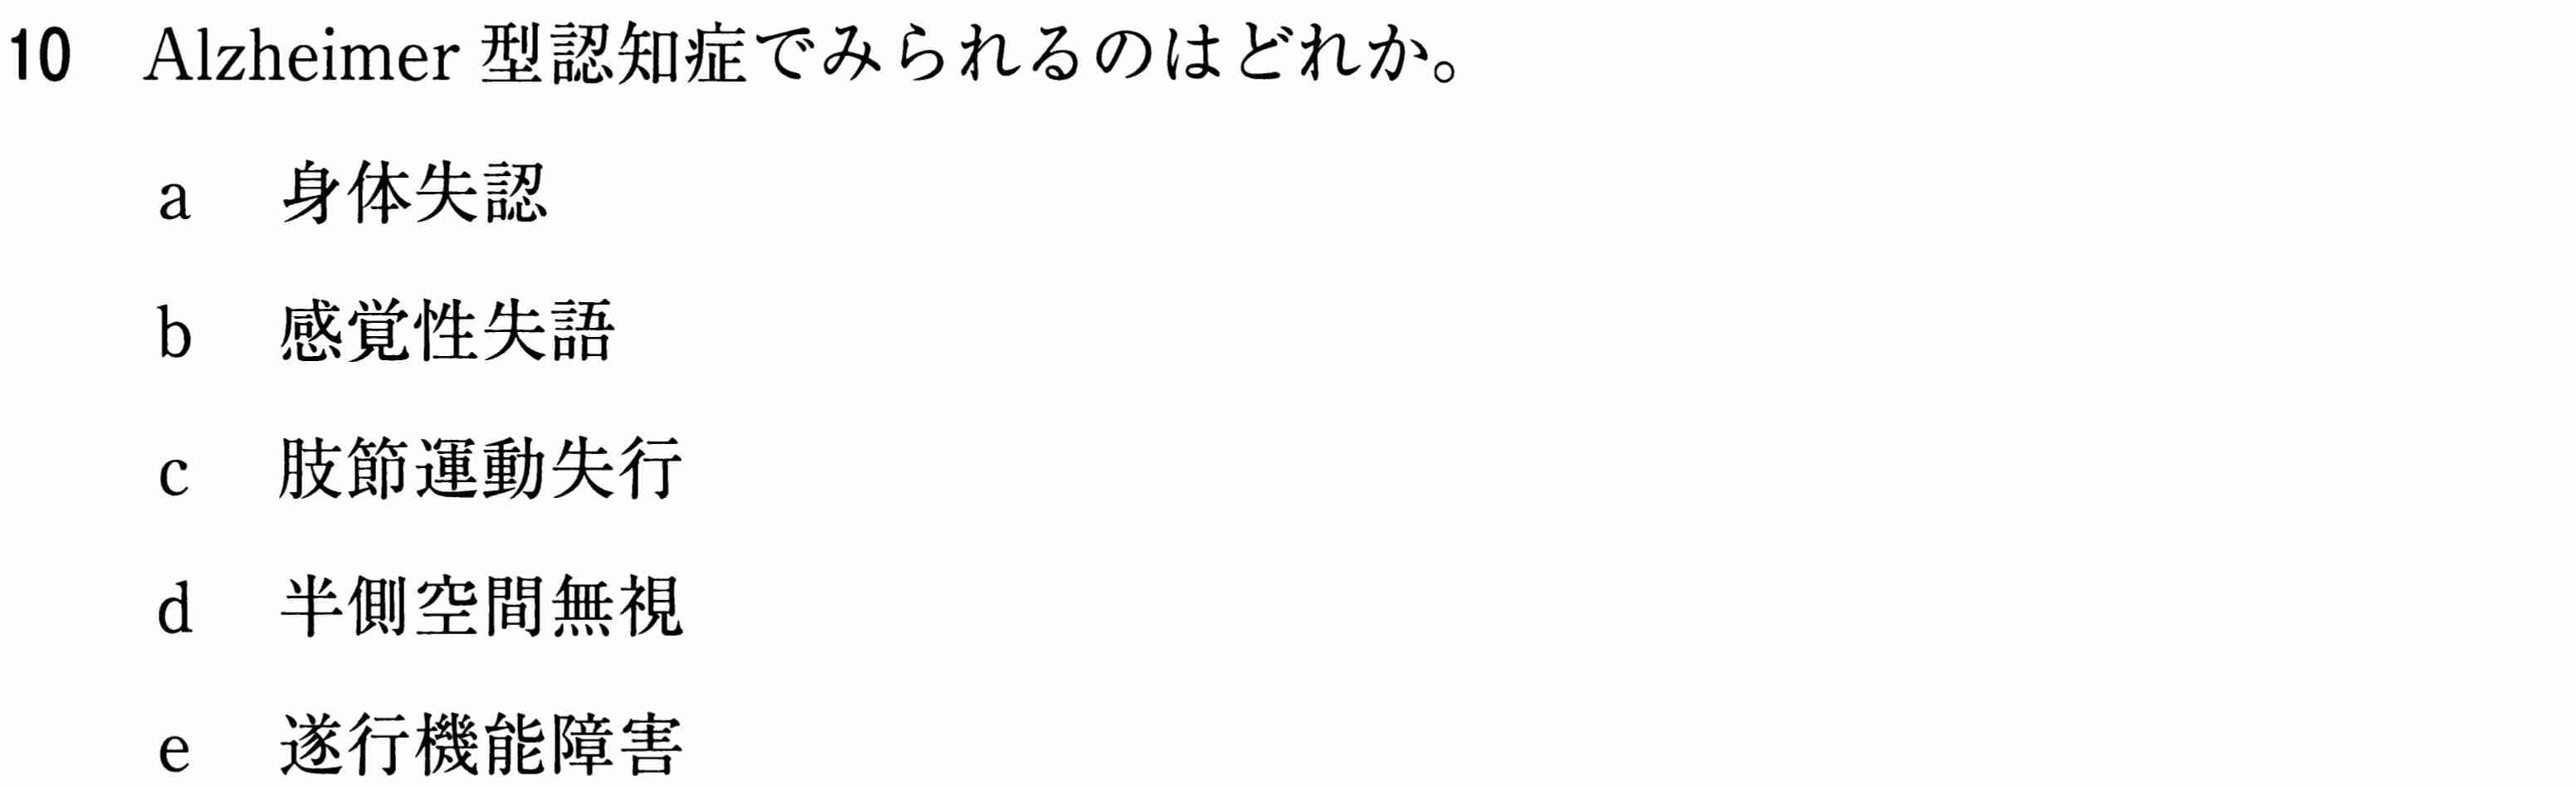 111E10.jpg